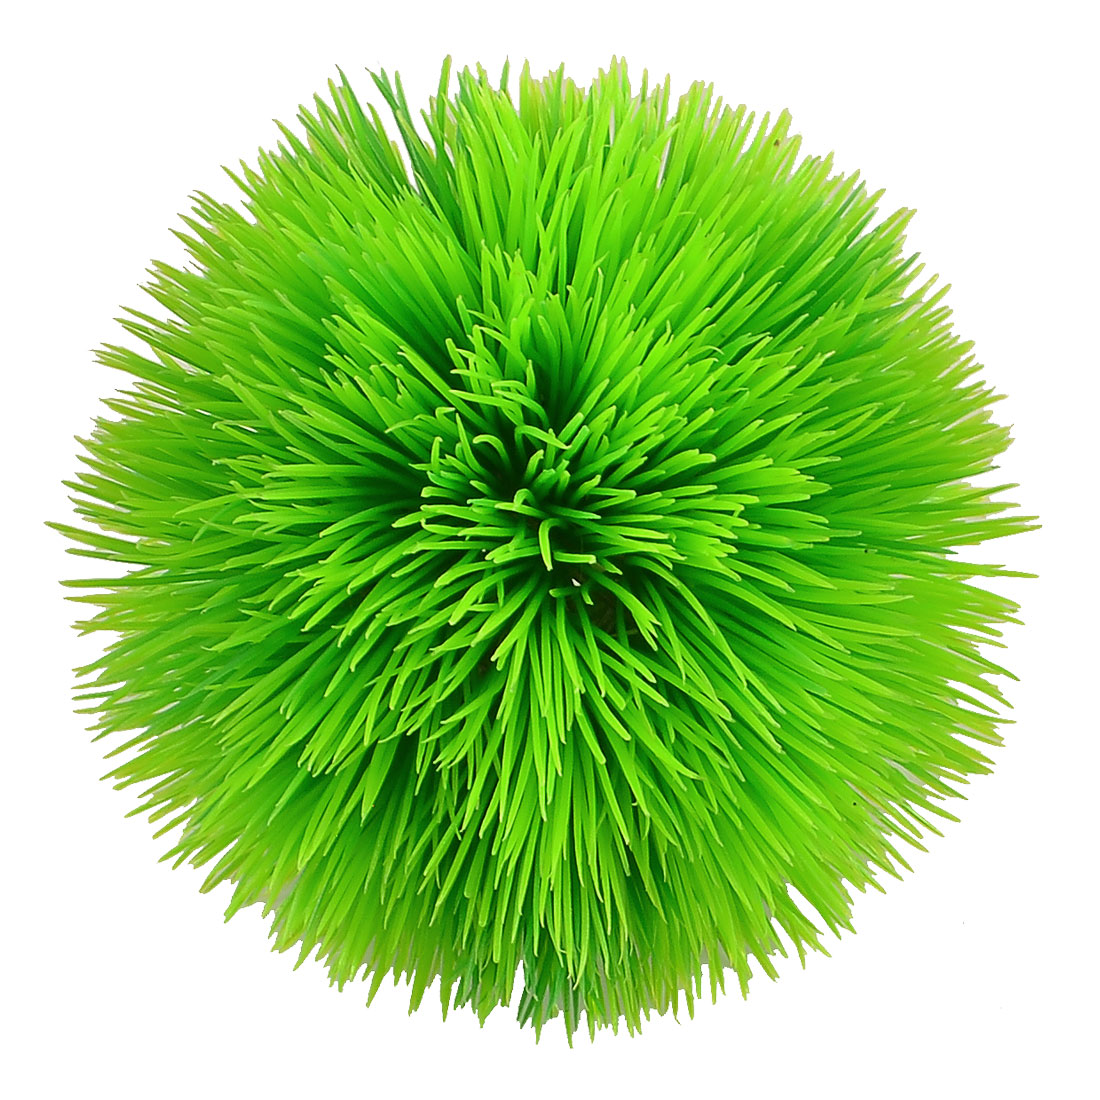 "Aquarium Fish Tank Green Leaves 4.1"" High Simulated Plastic Plant Grass"